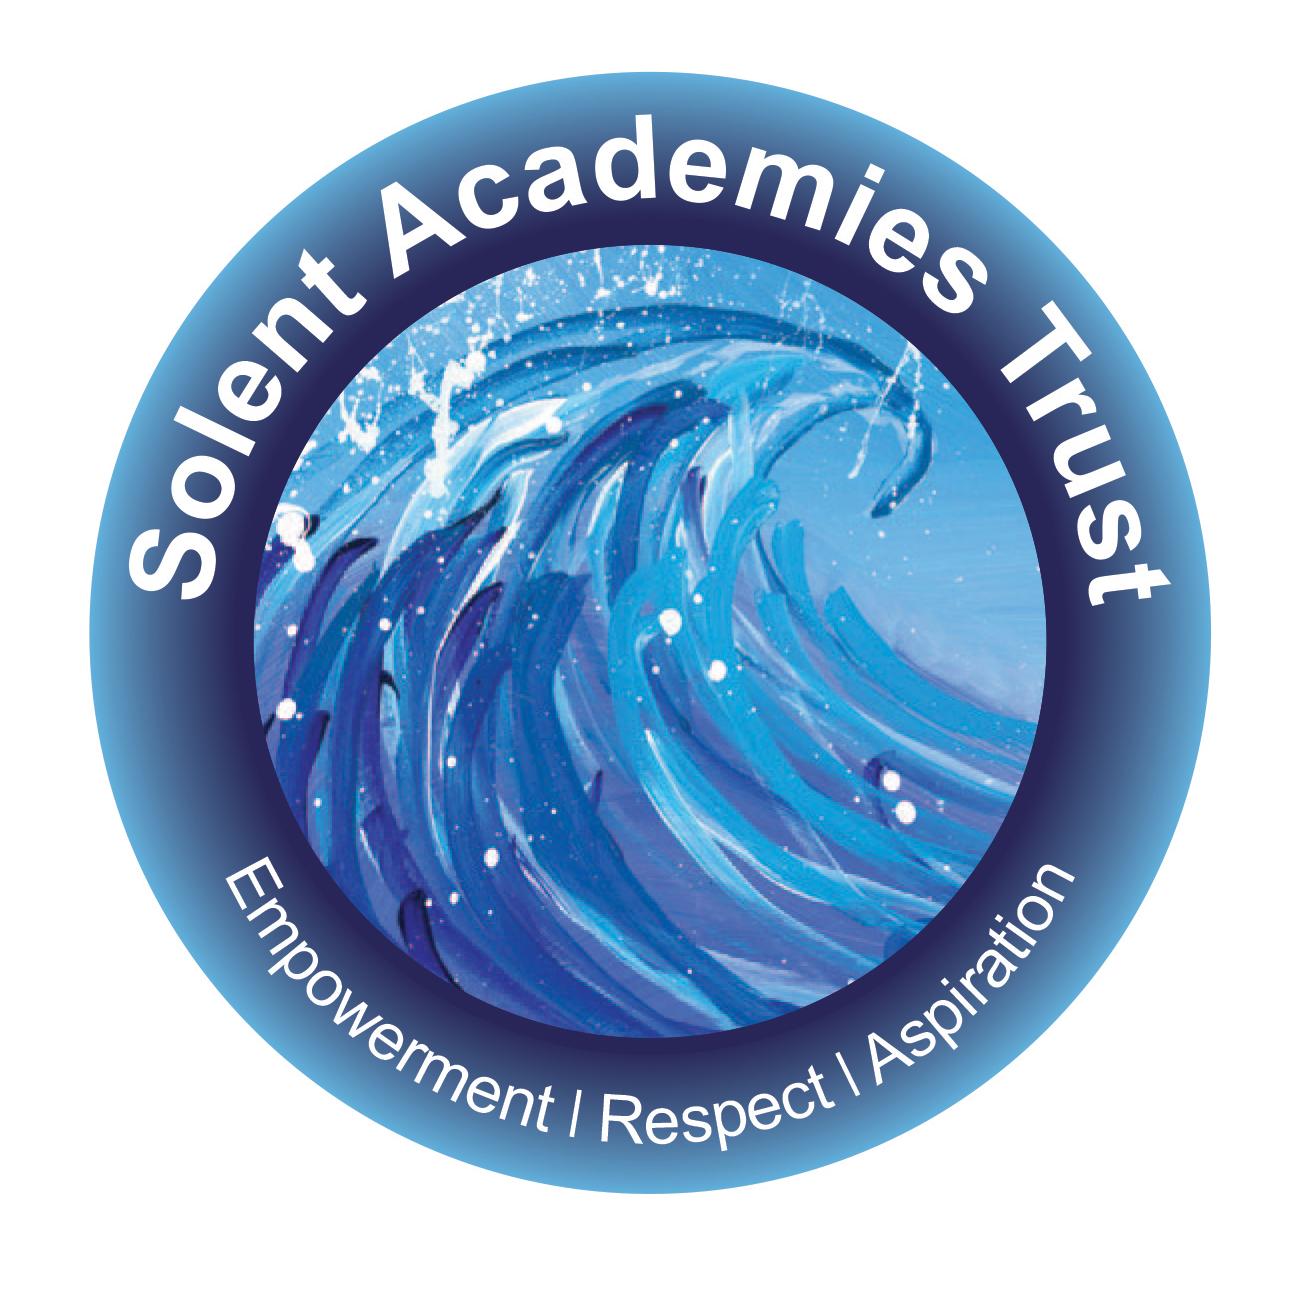 Solent Academies Trust